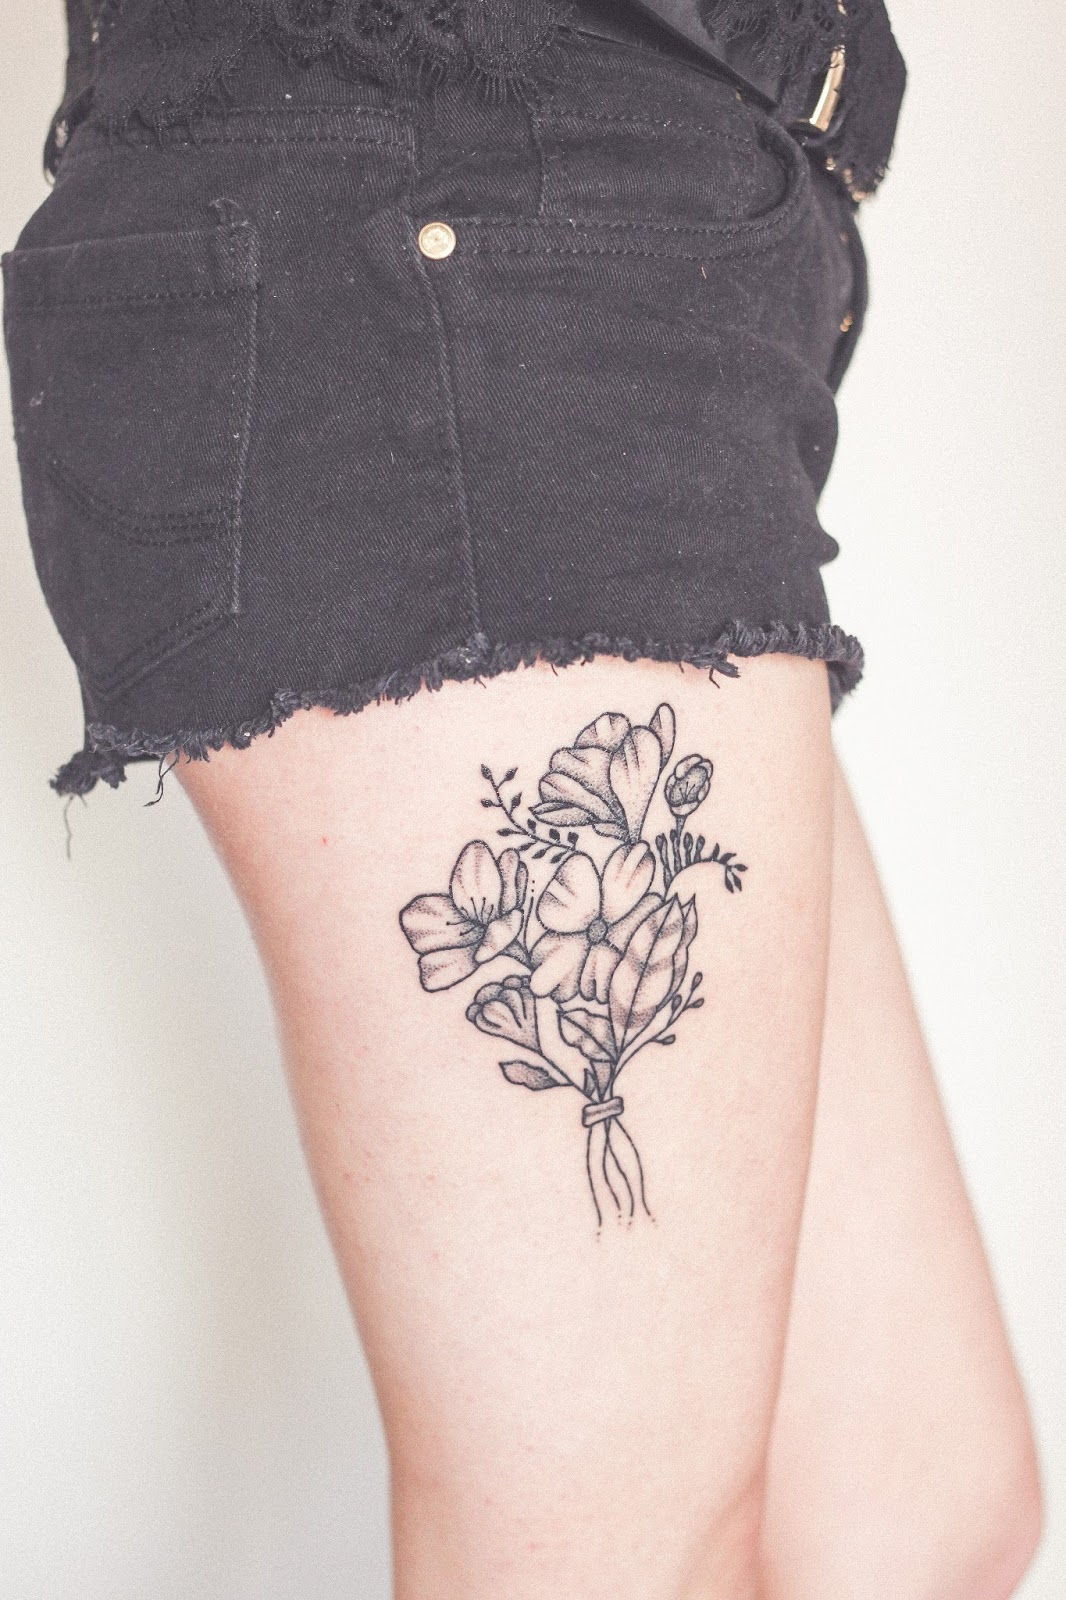 First tattoo experience | www.hannahemilylane.com